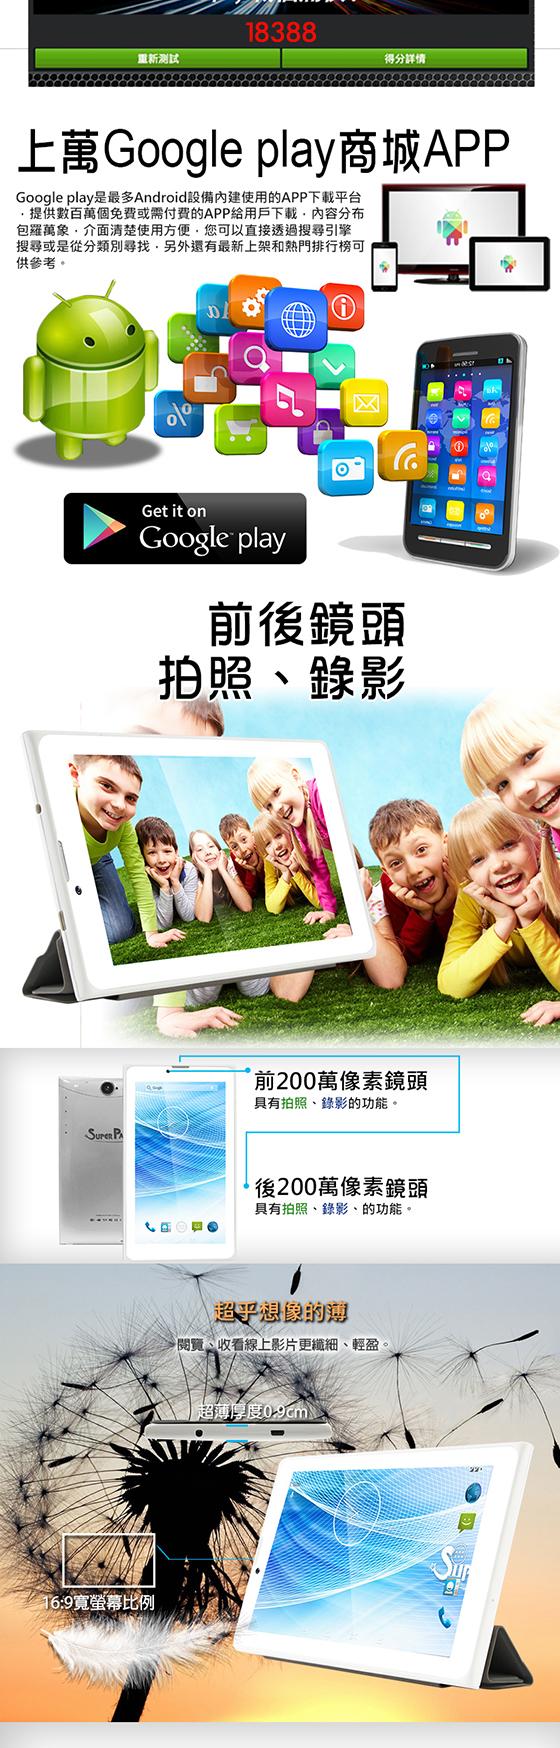 A1-769X八核架構3G通話平板-800_02.jpg